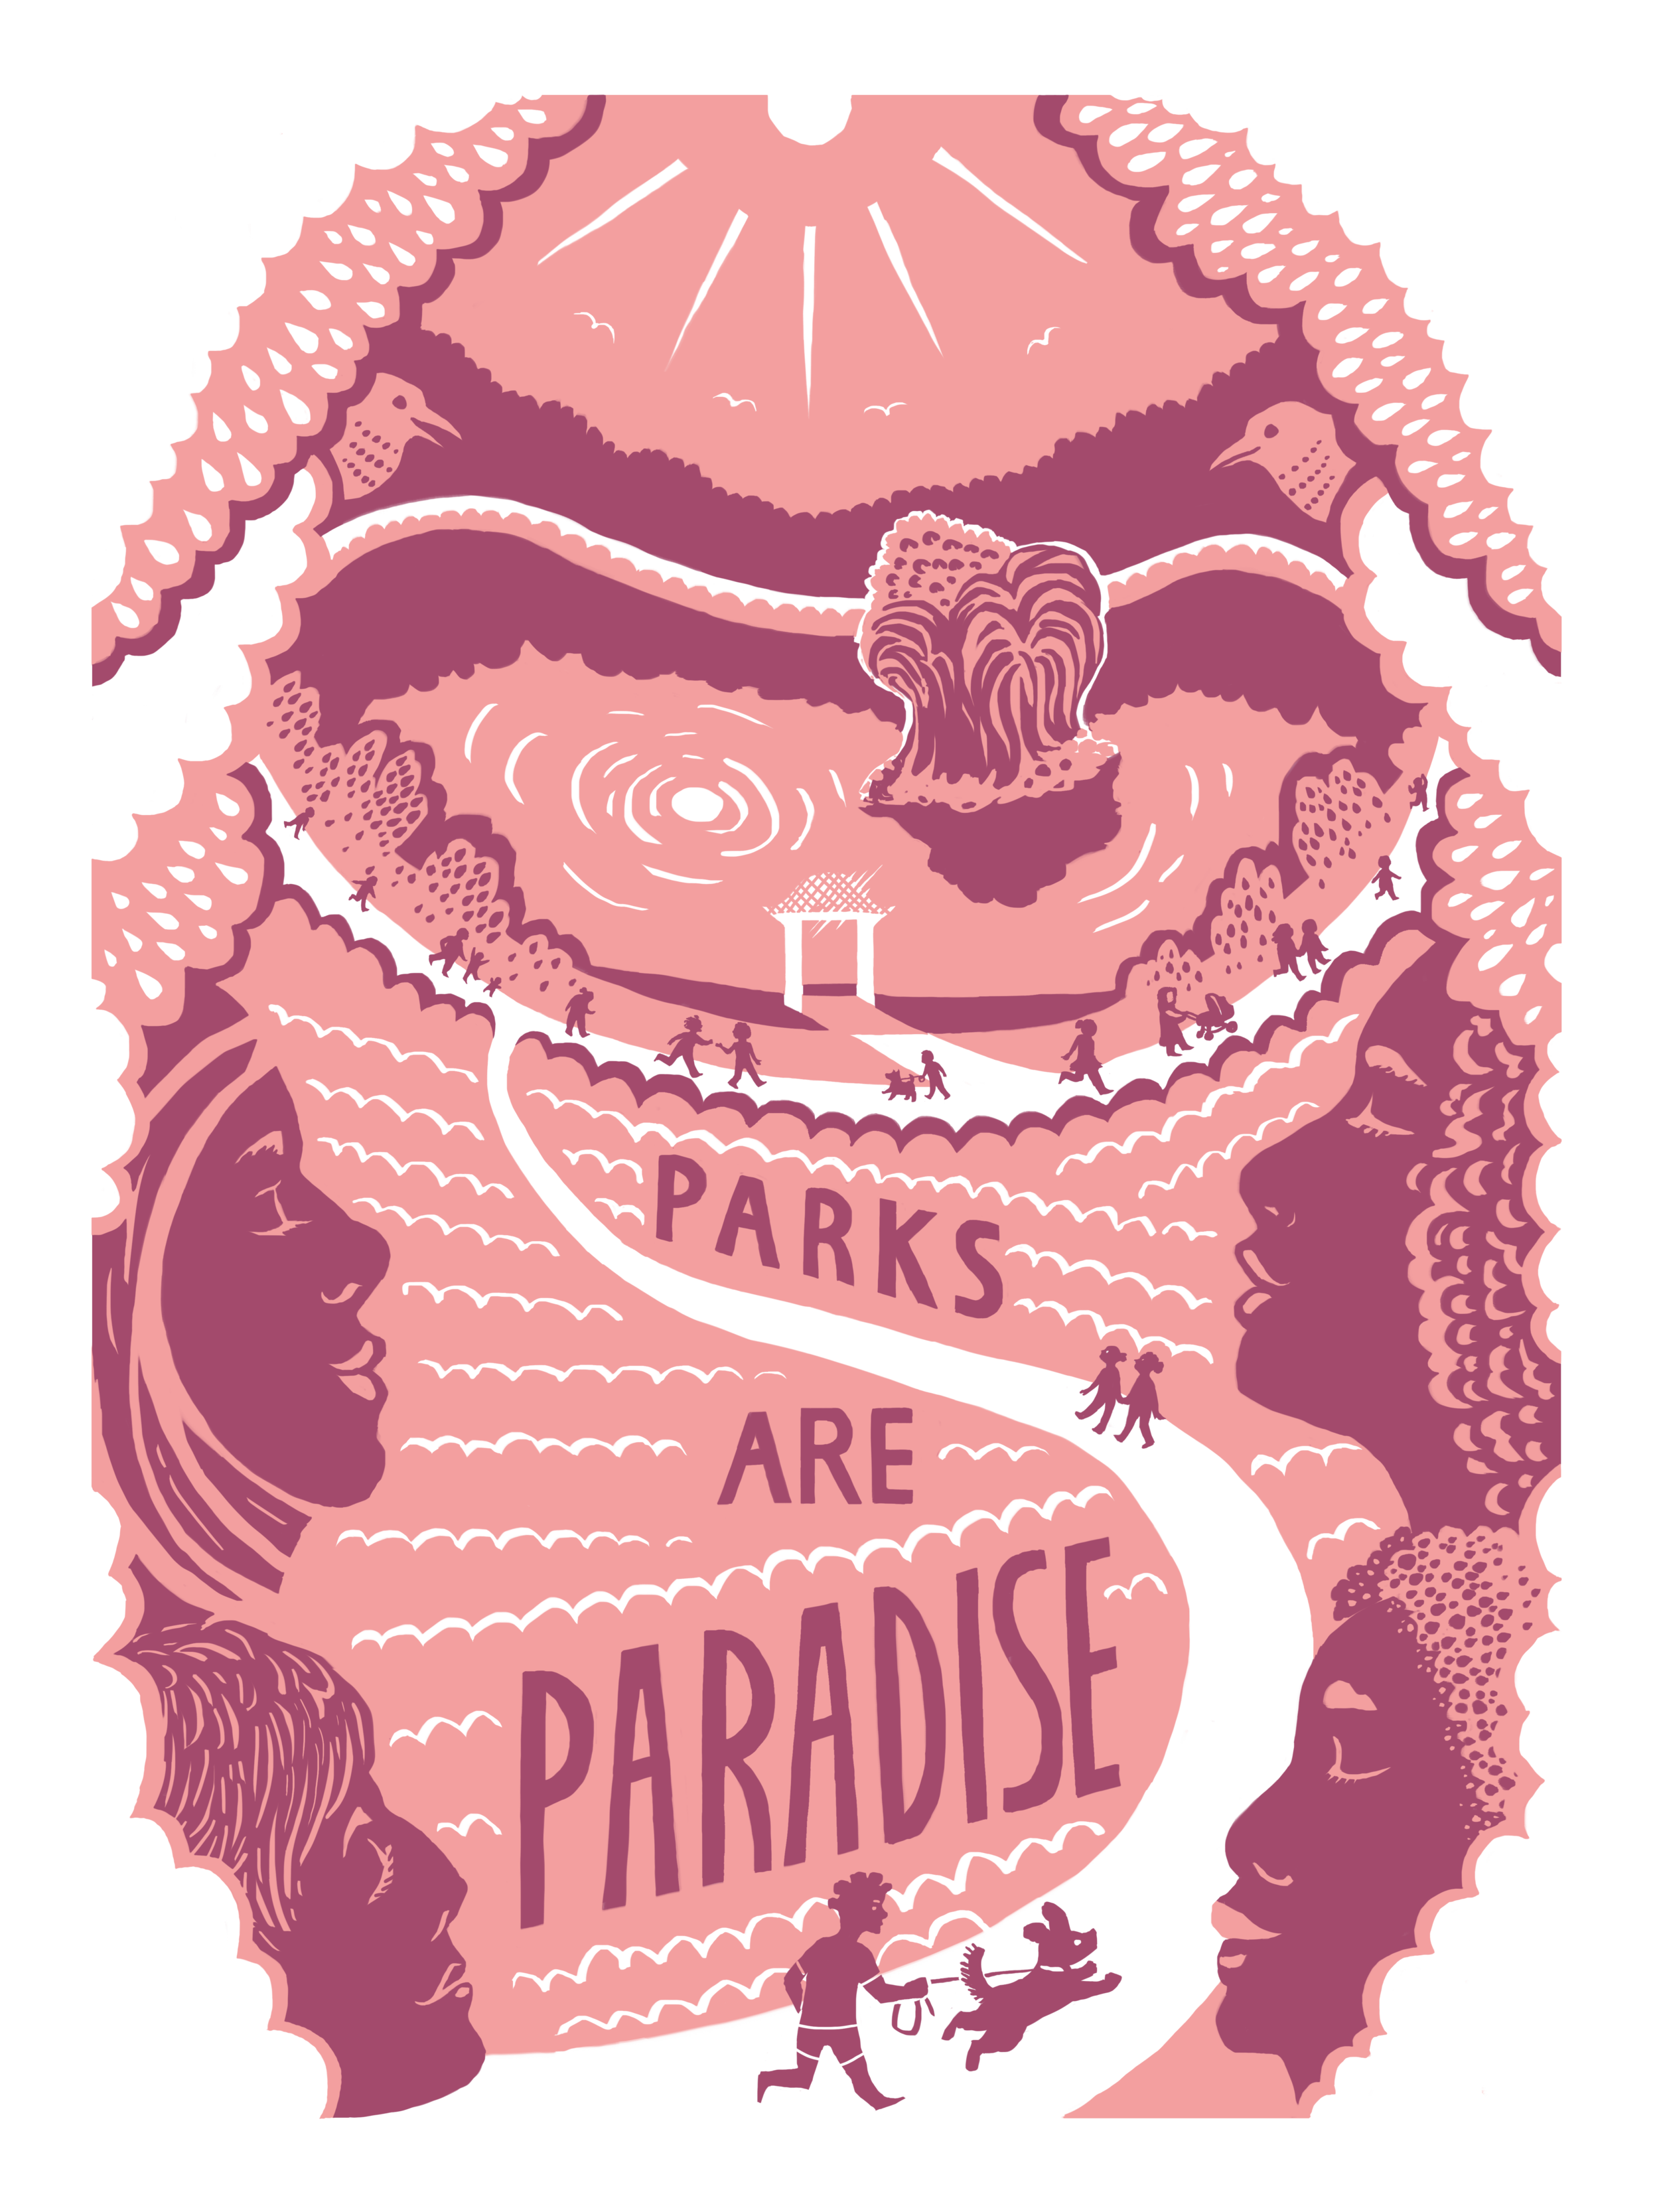 ParksareParadise_VioletaRotstein_final2.png